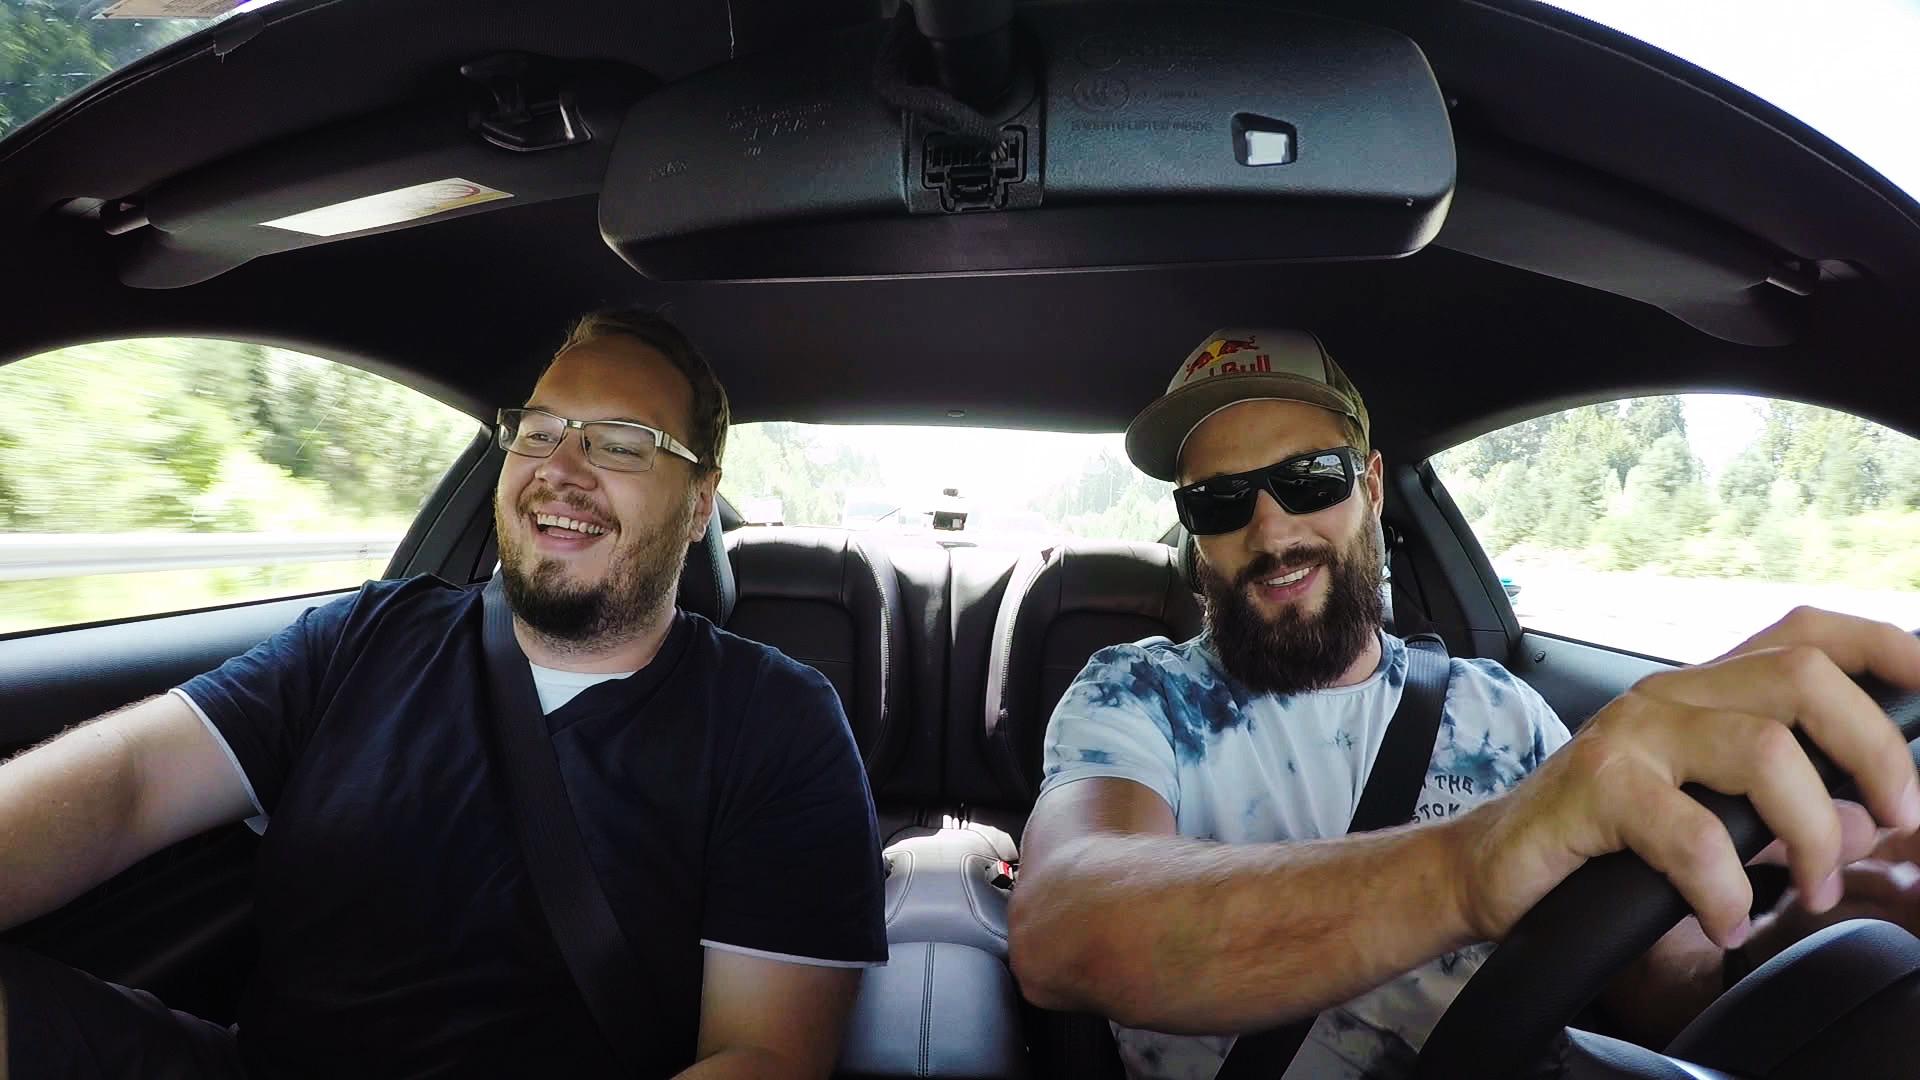 #Neukrotljivi: Zaključujemo prvo sezono Fordove video-serije